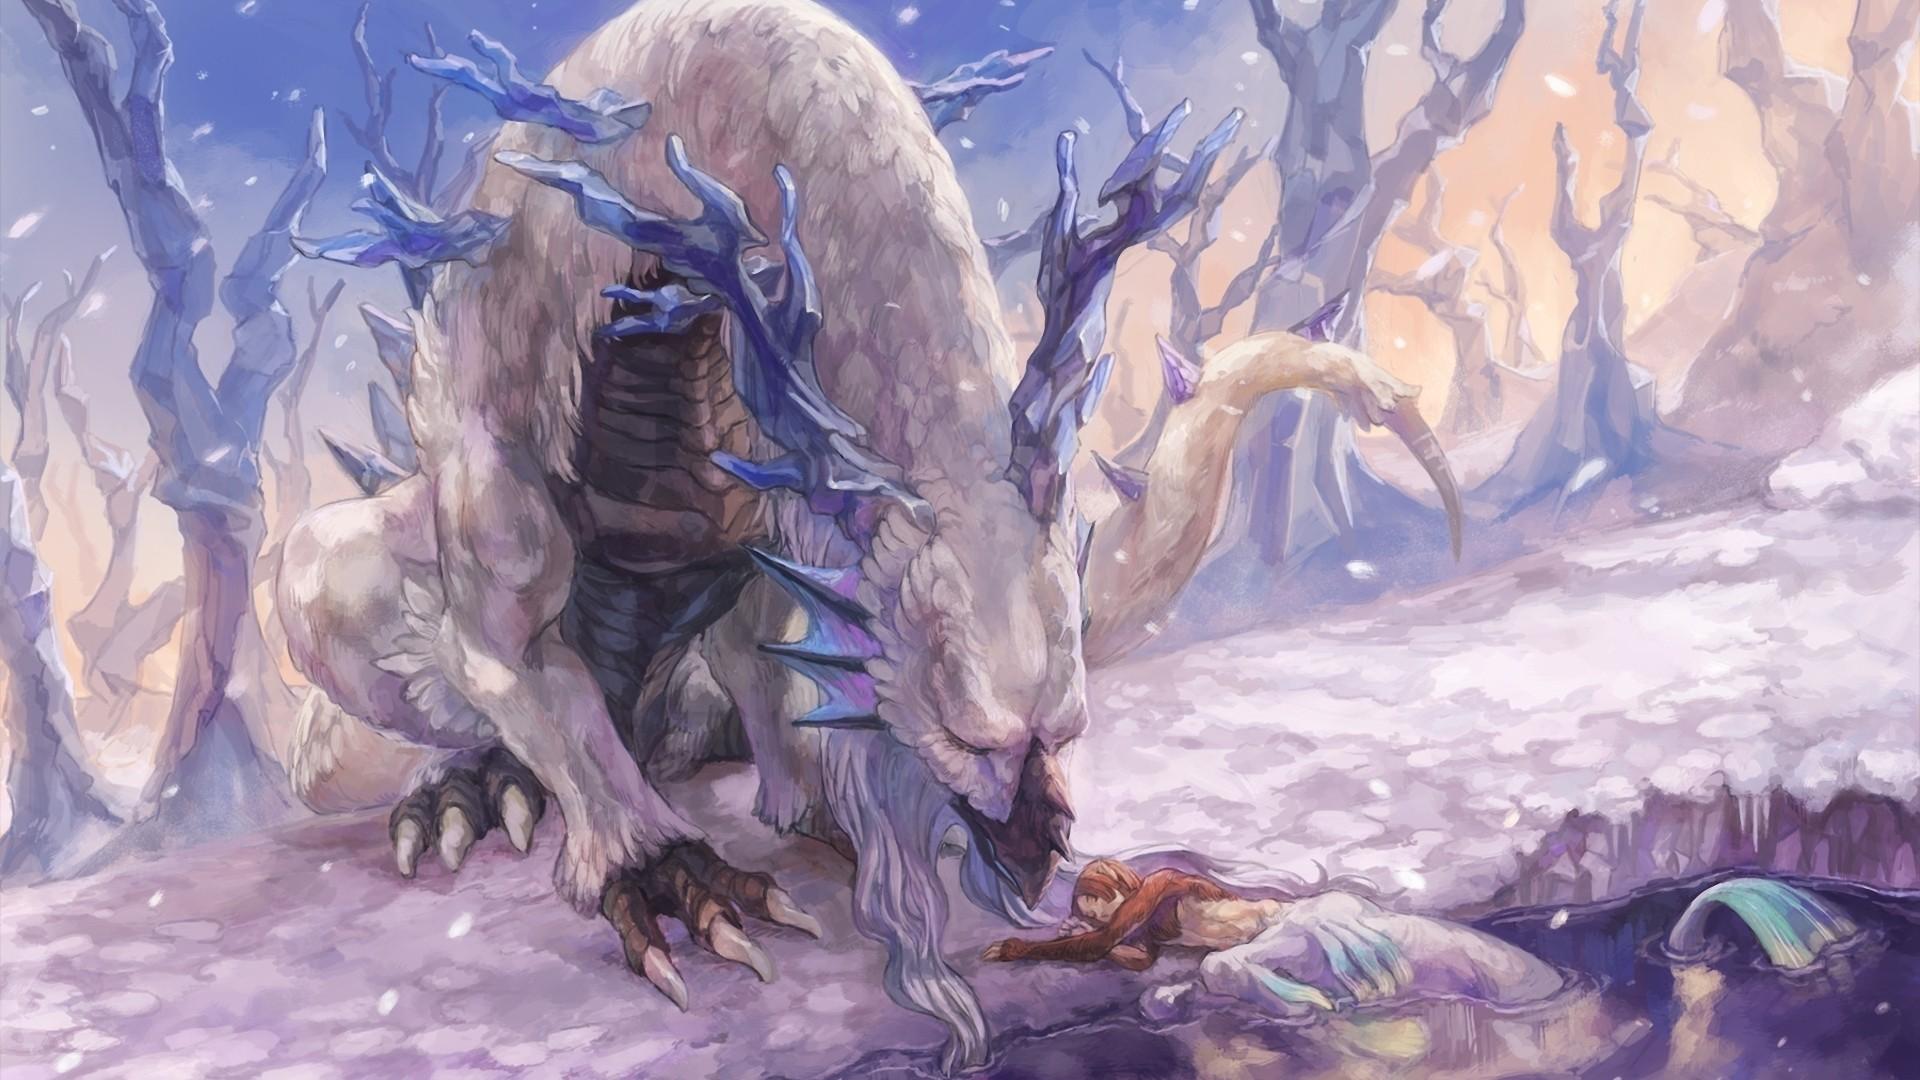 Ice Dragon Desktop Wallpapers 600x382